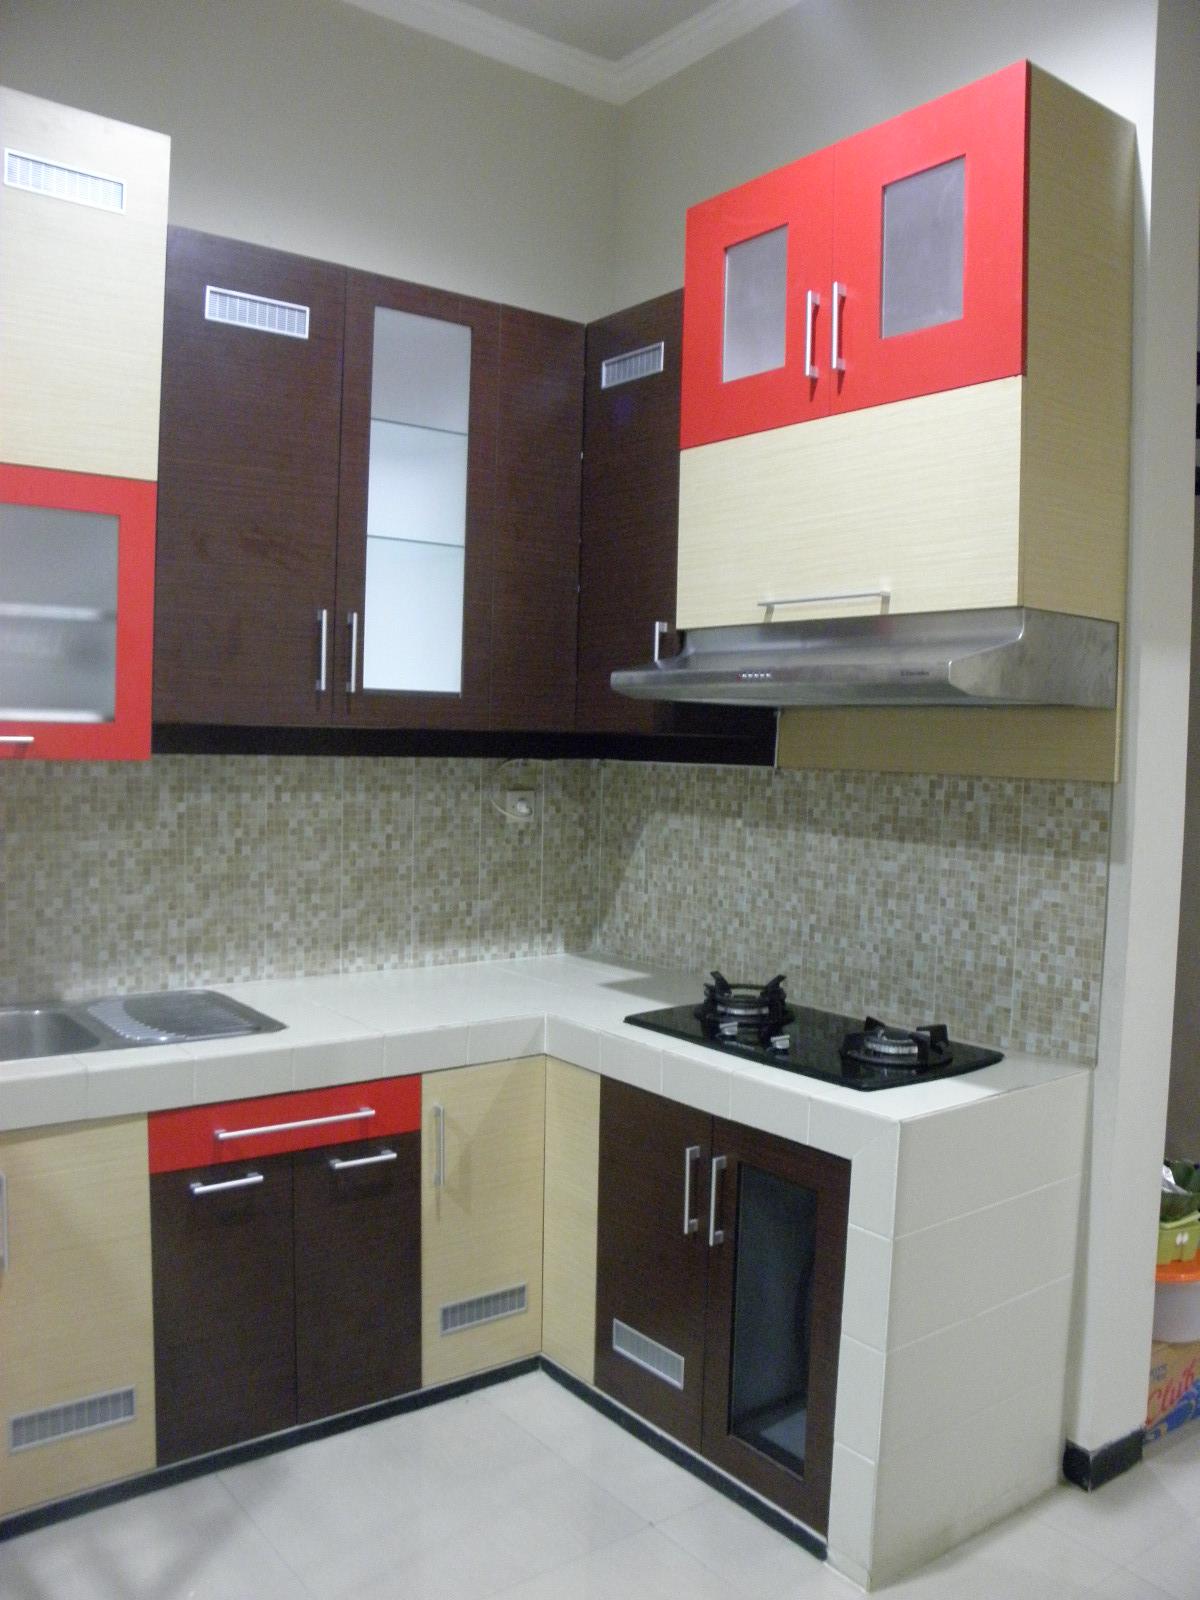 Buat Kitchen Set Mini Dengan Harga Murah Duniakitchenset Com